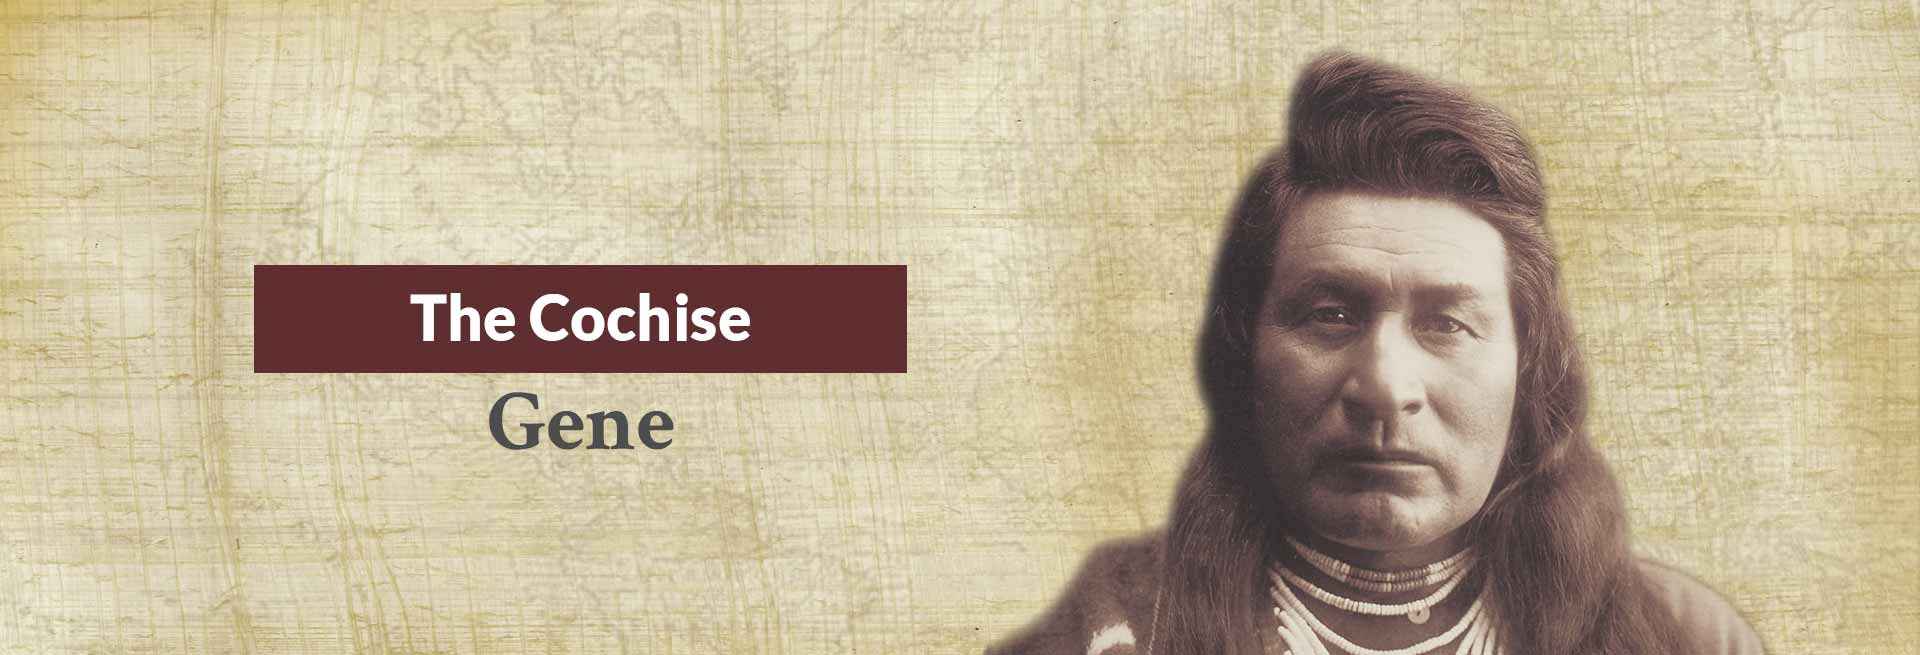 The Cochise Gene Banner